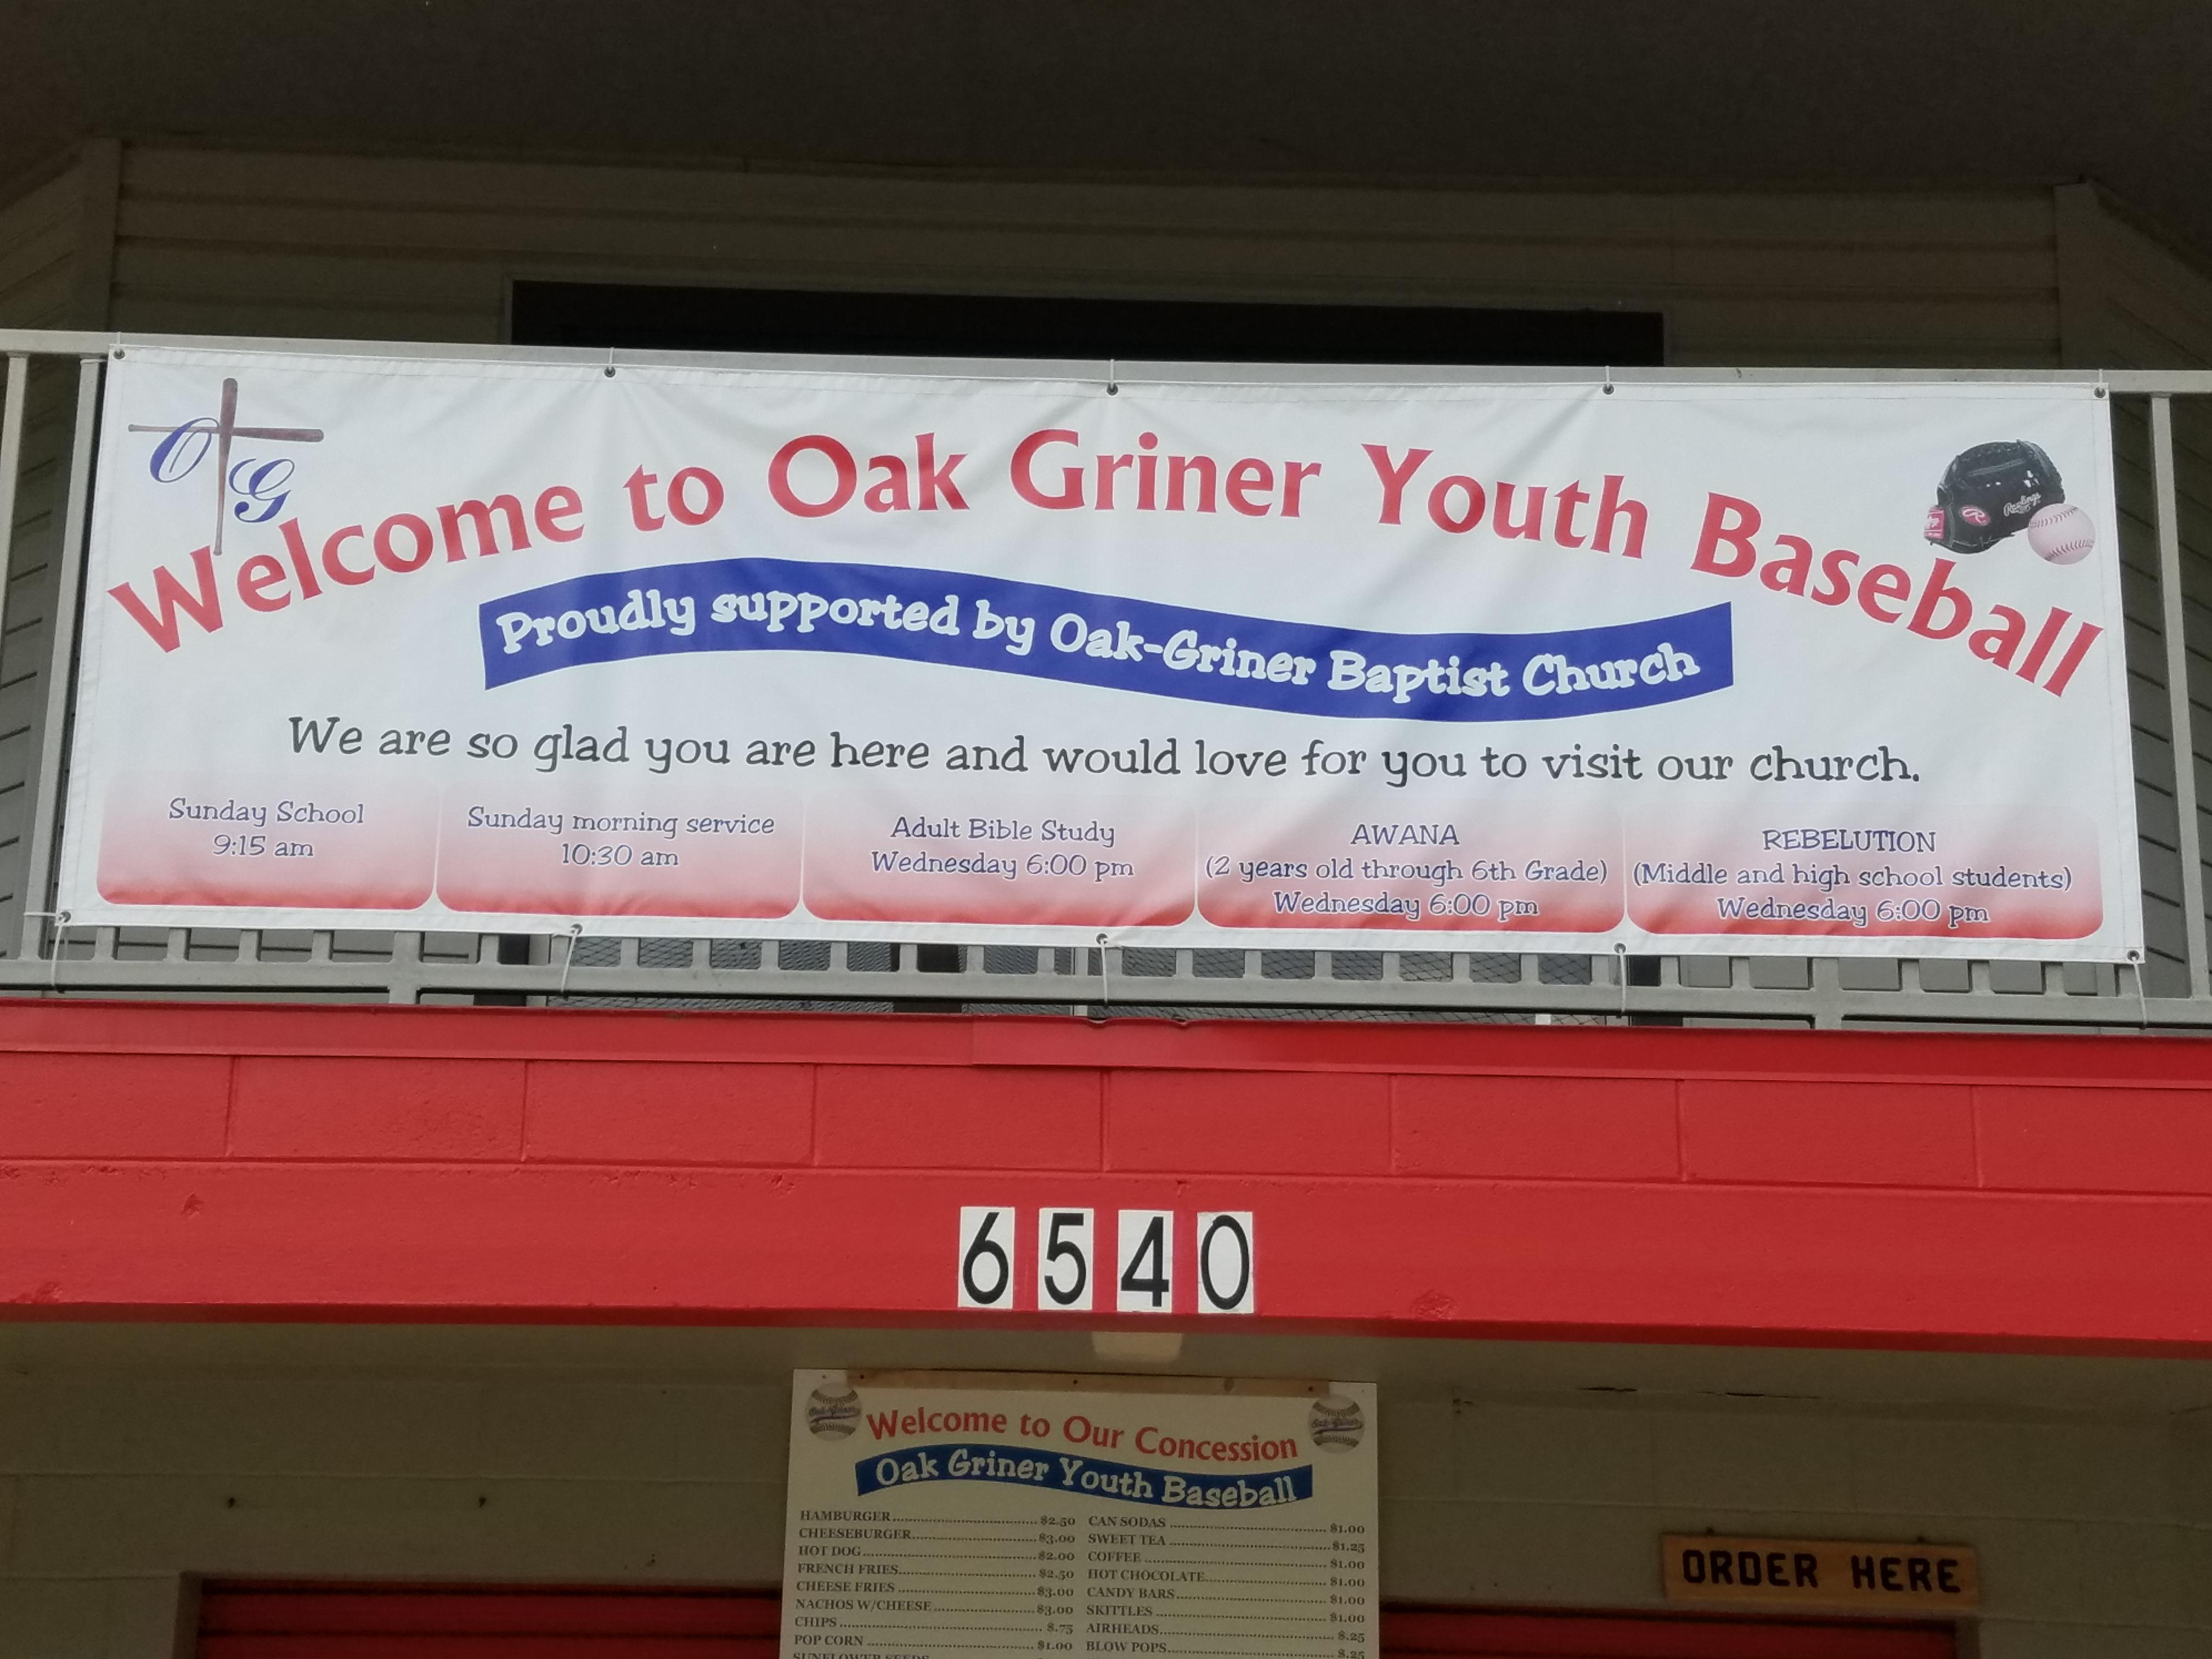 08-2016-oak-griner-youth-baseball